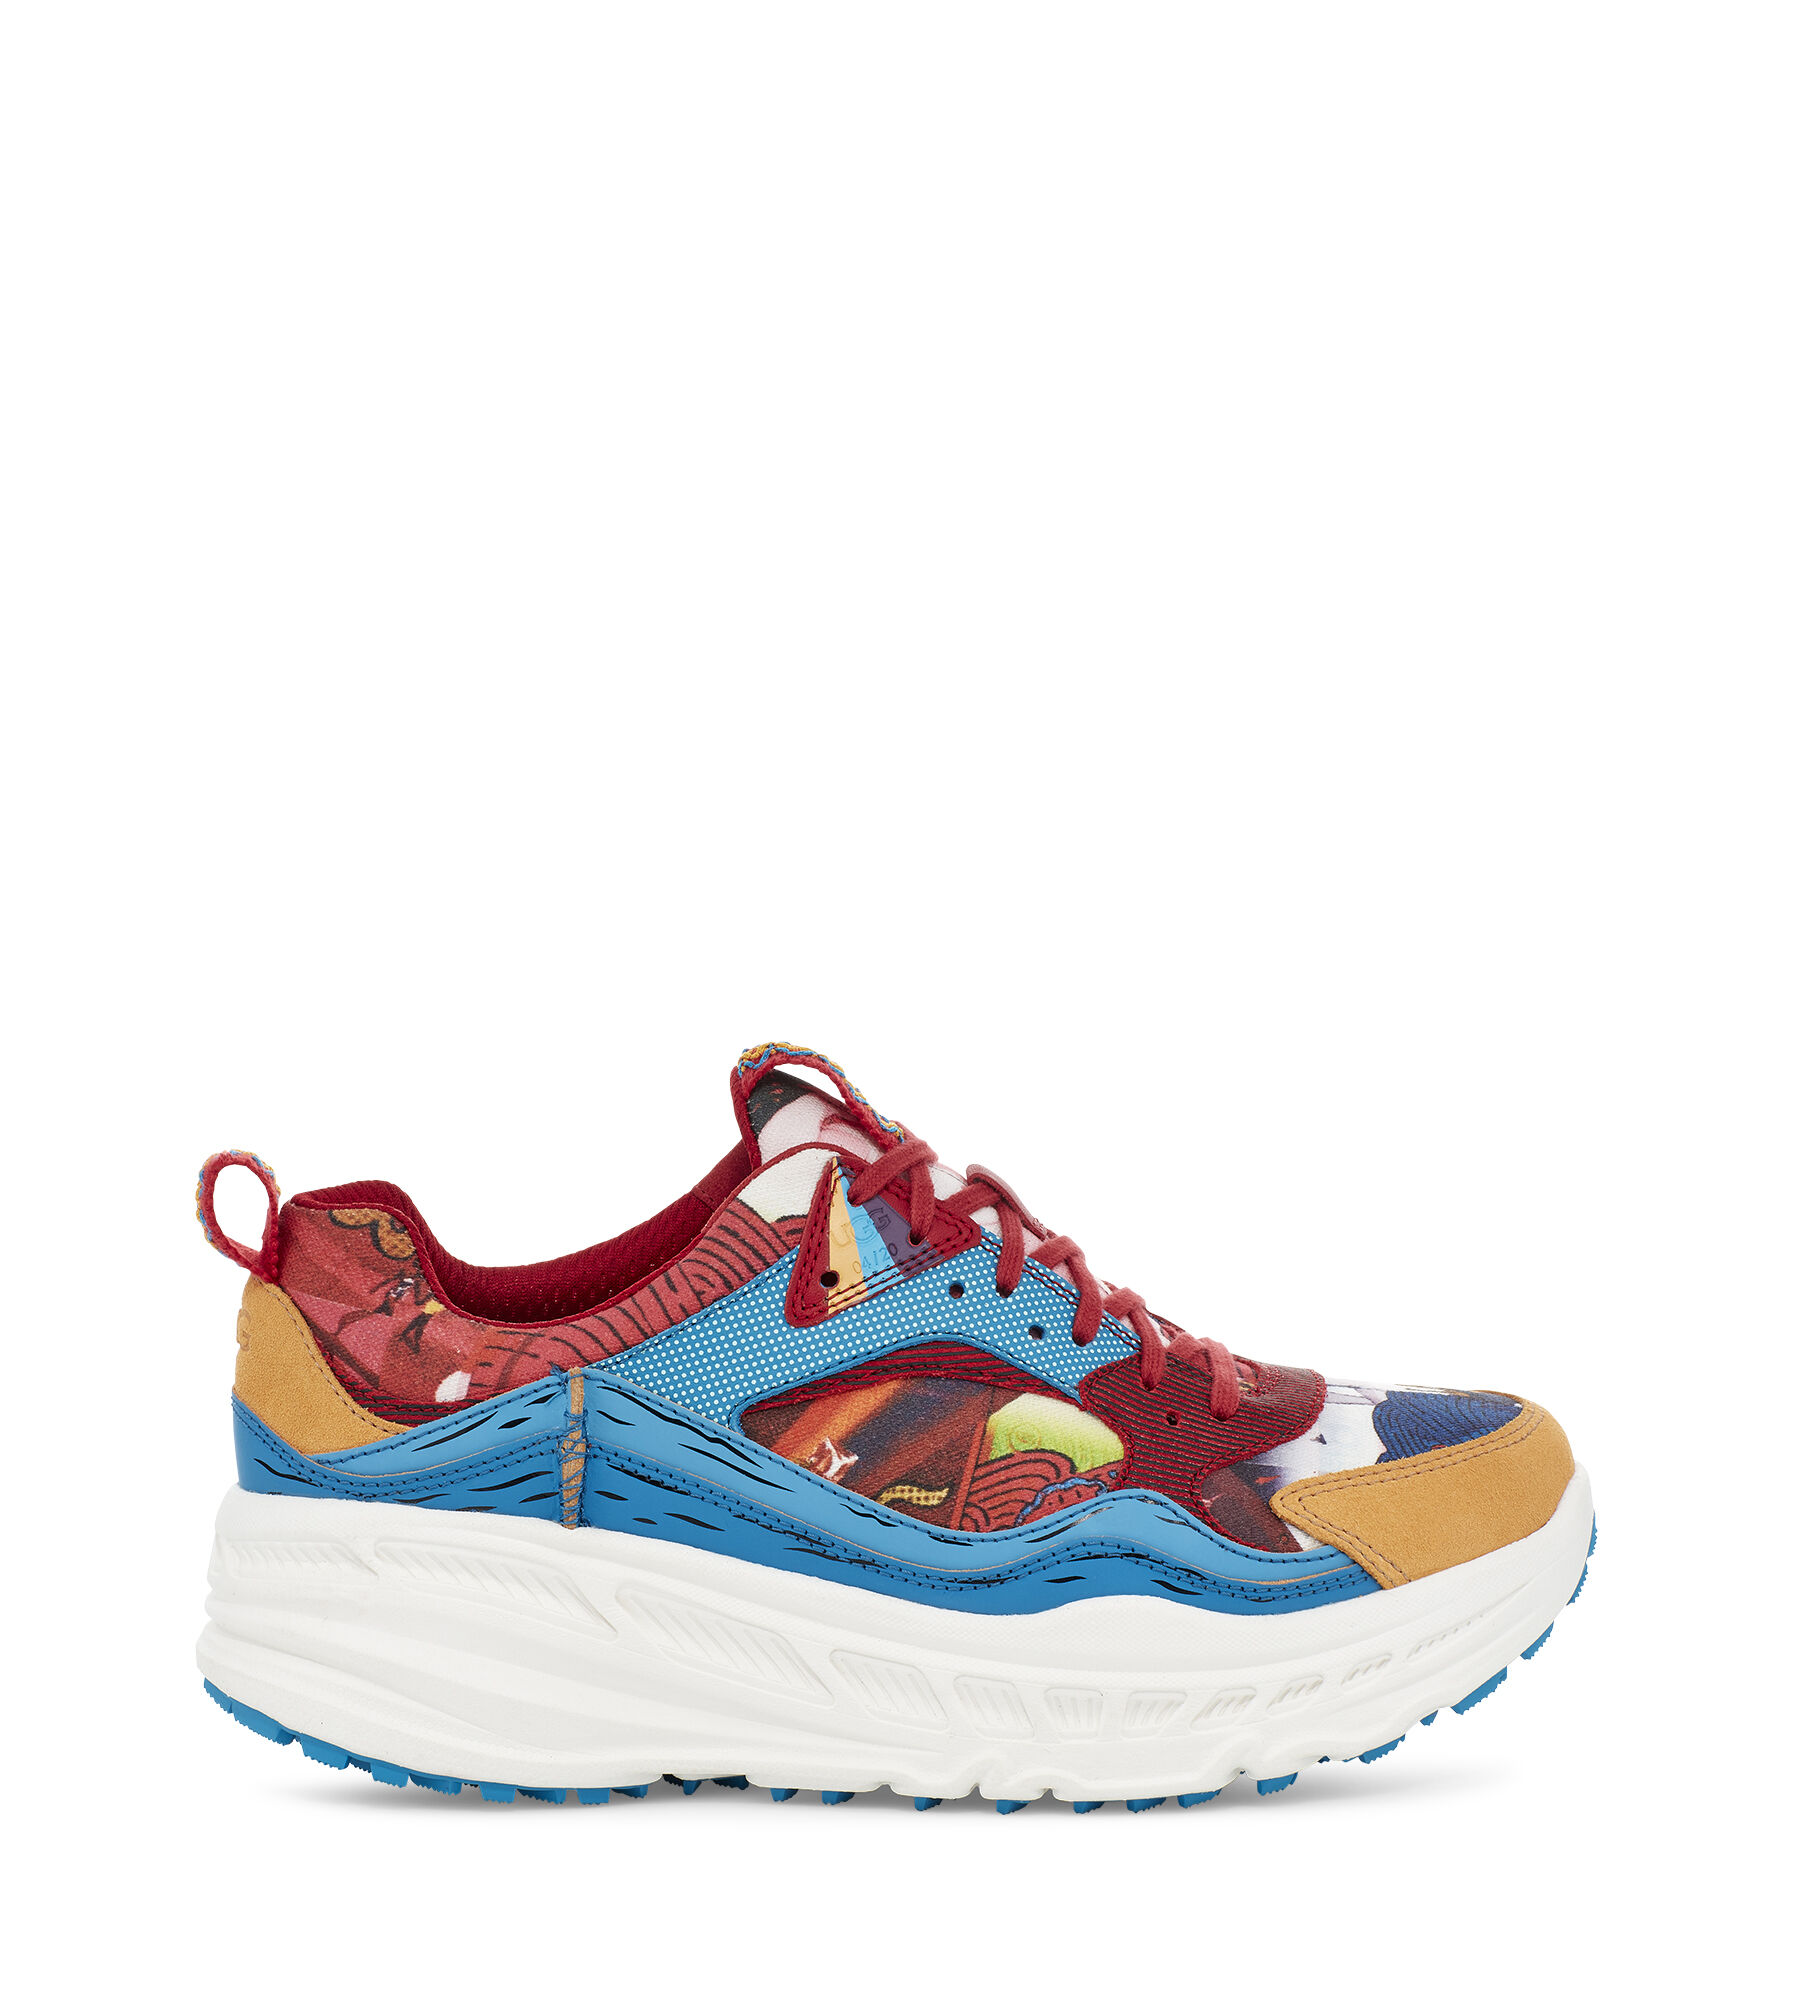 Fashion Sneakers \u0026 Casual Slip-Ons